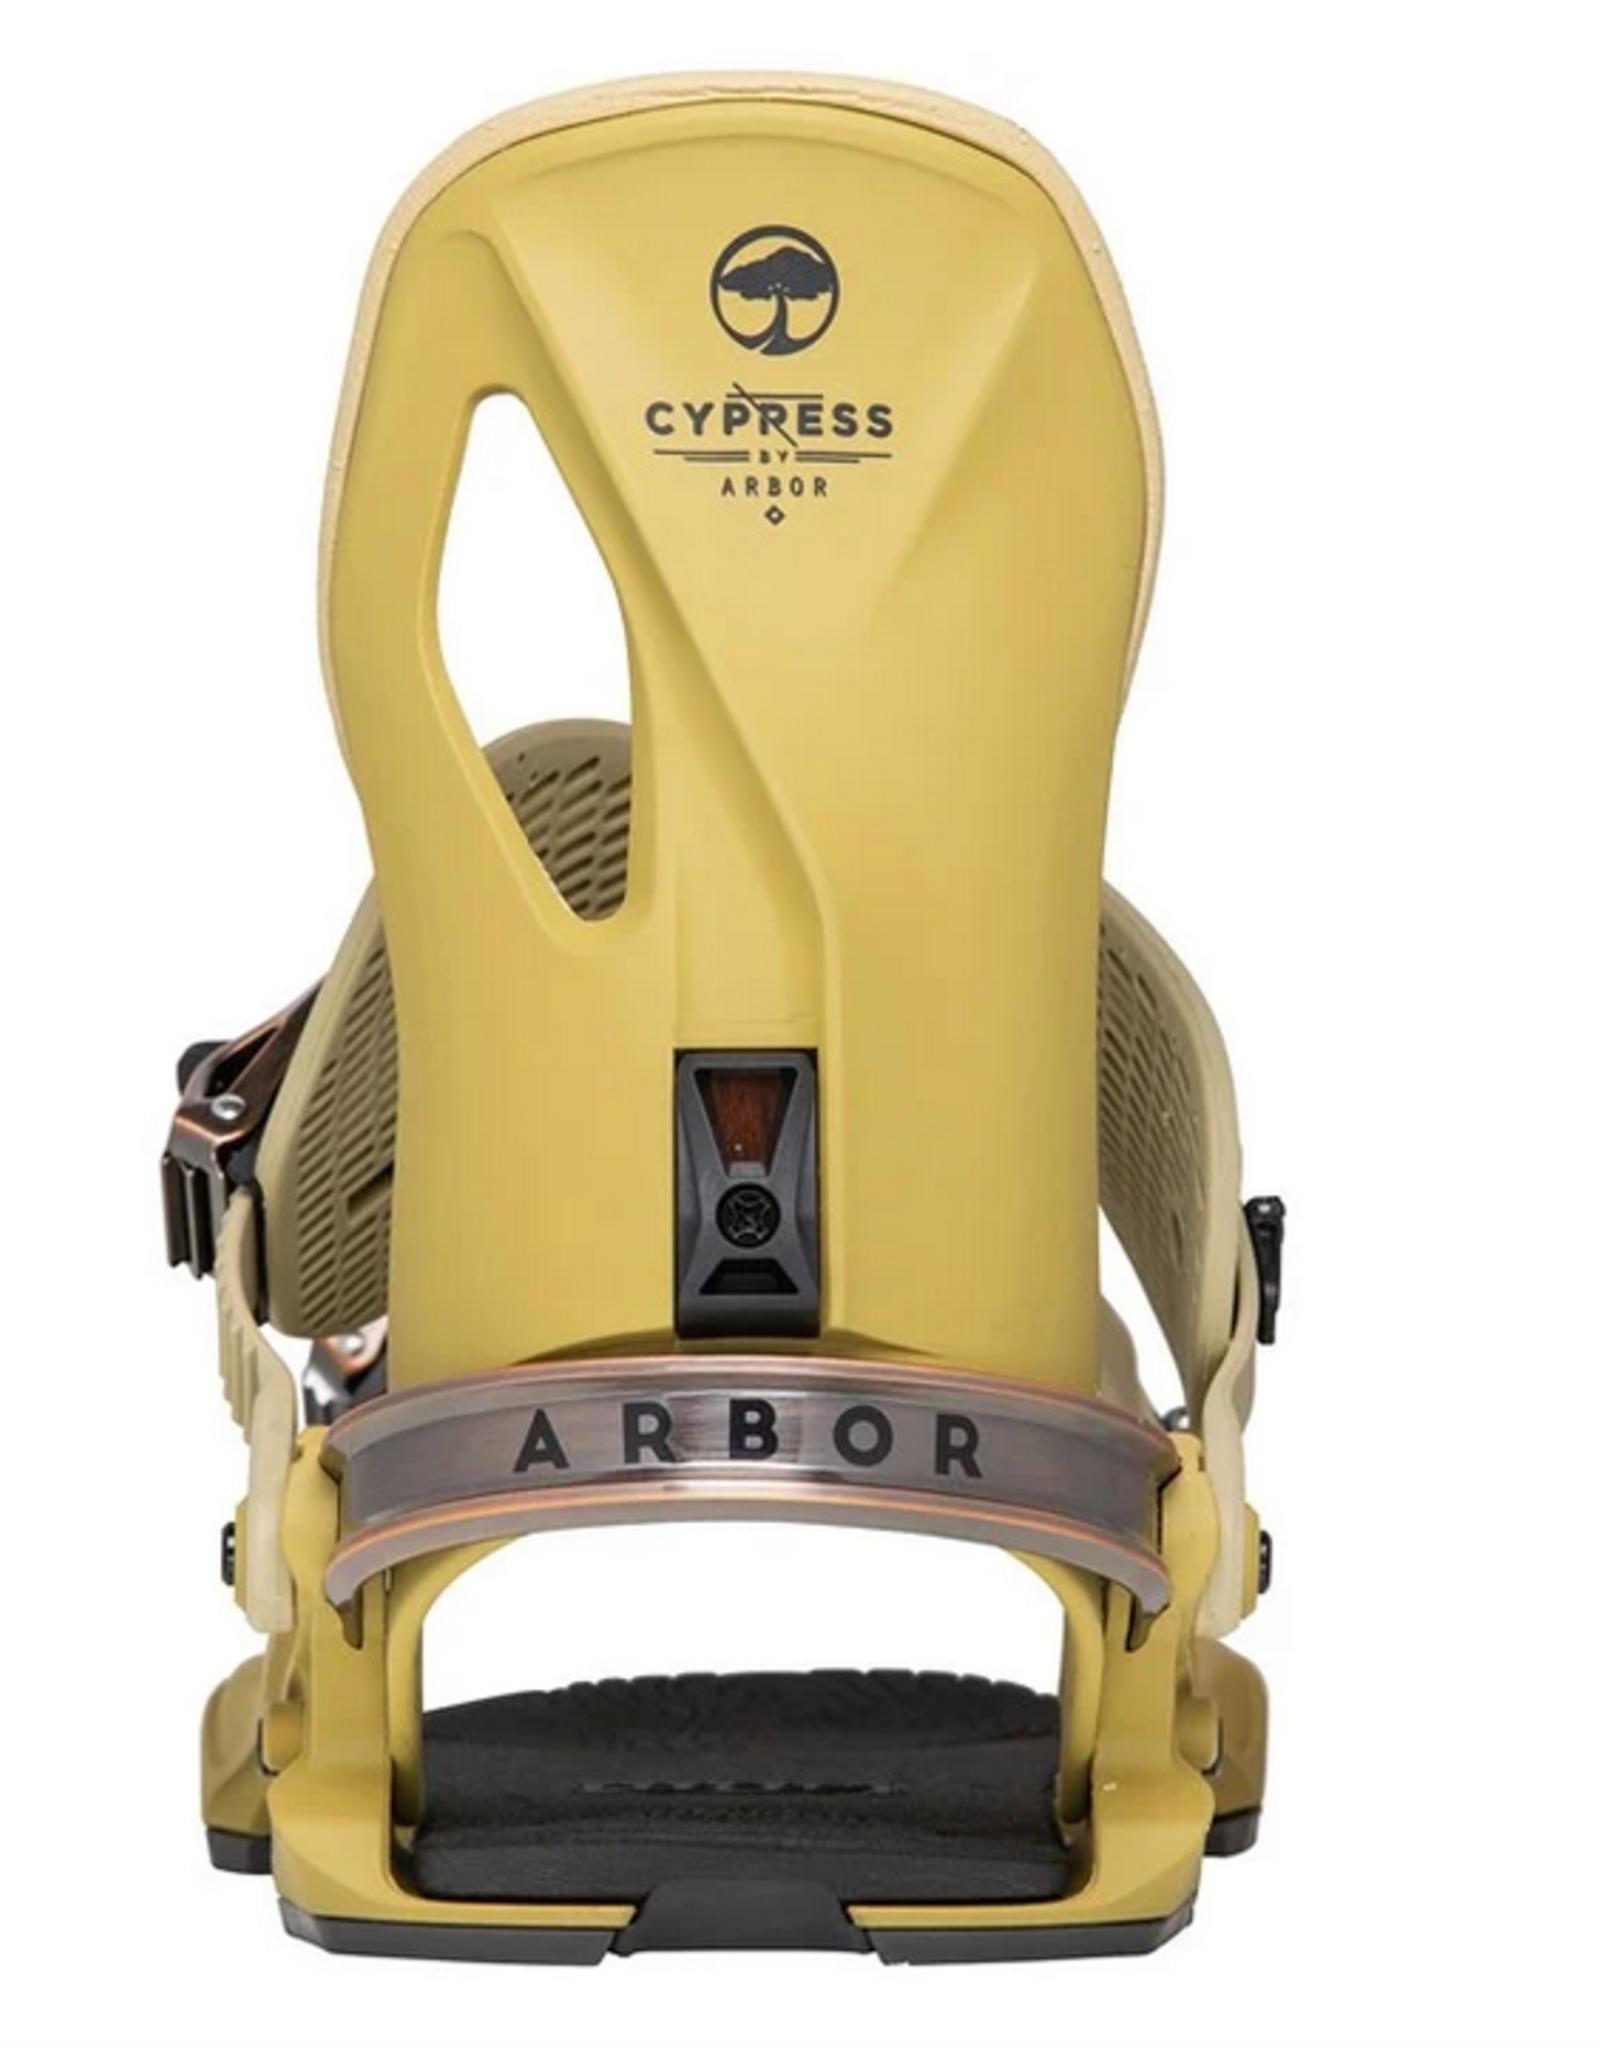 ARBOR ARBOR 2022 CYPRESS SNOWBOARD BINDINGS DRIED TOBACCO